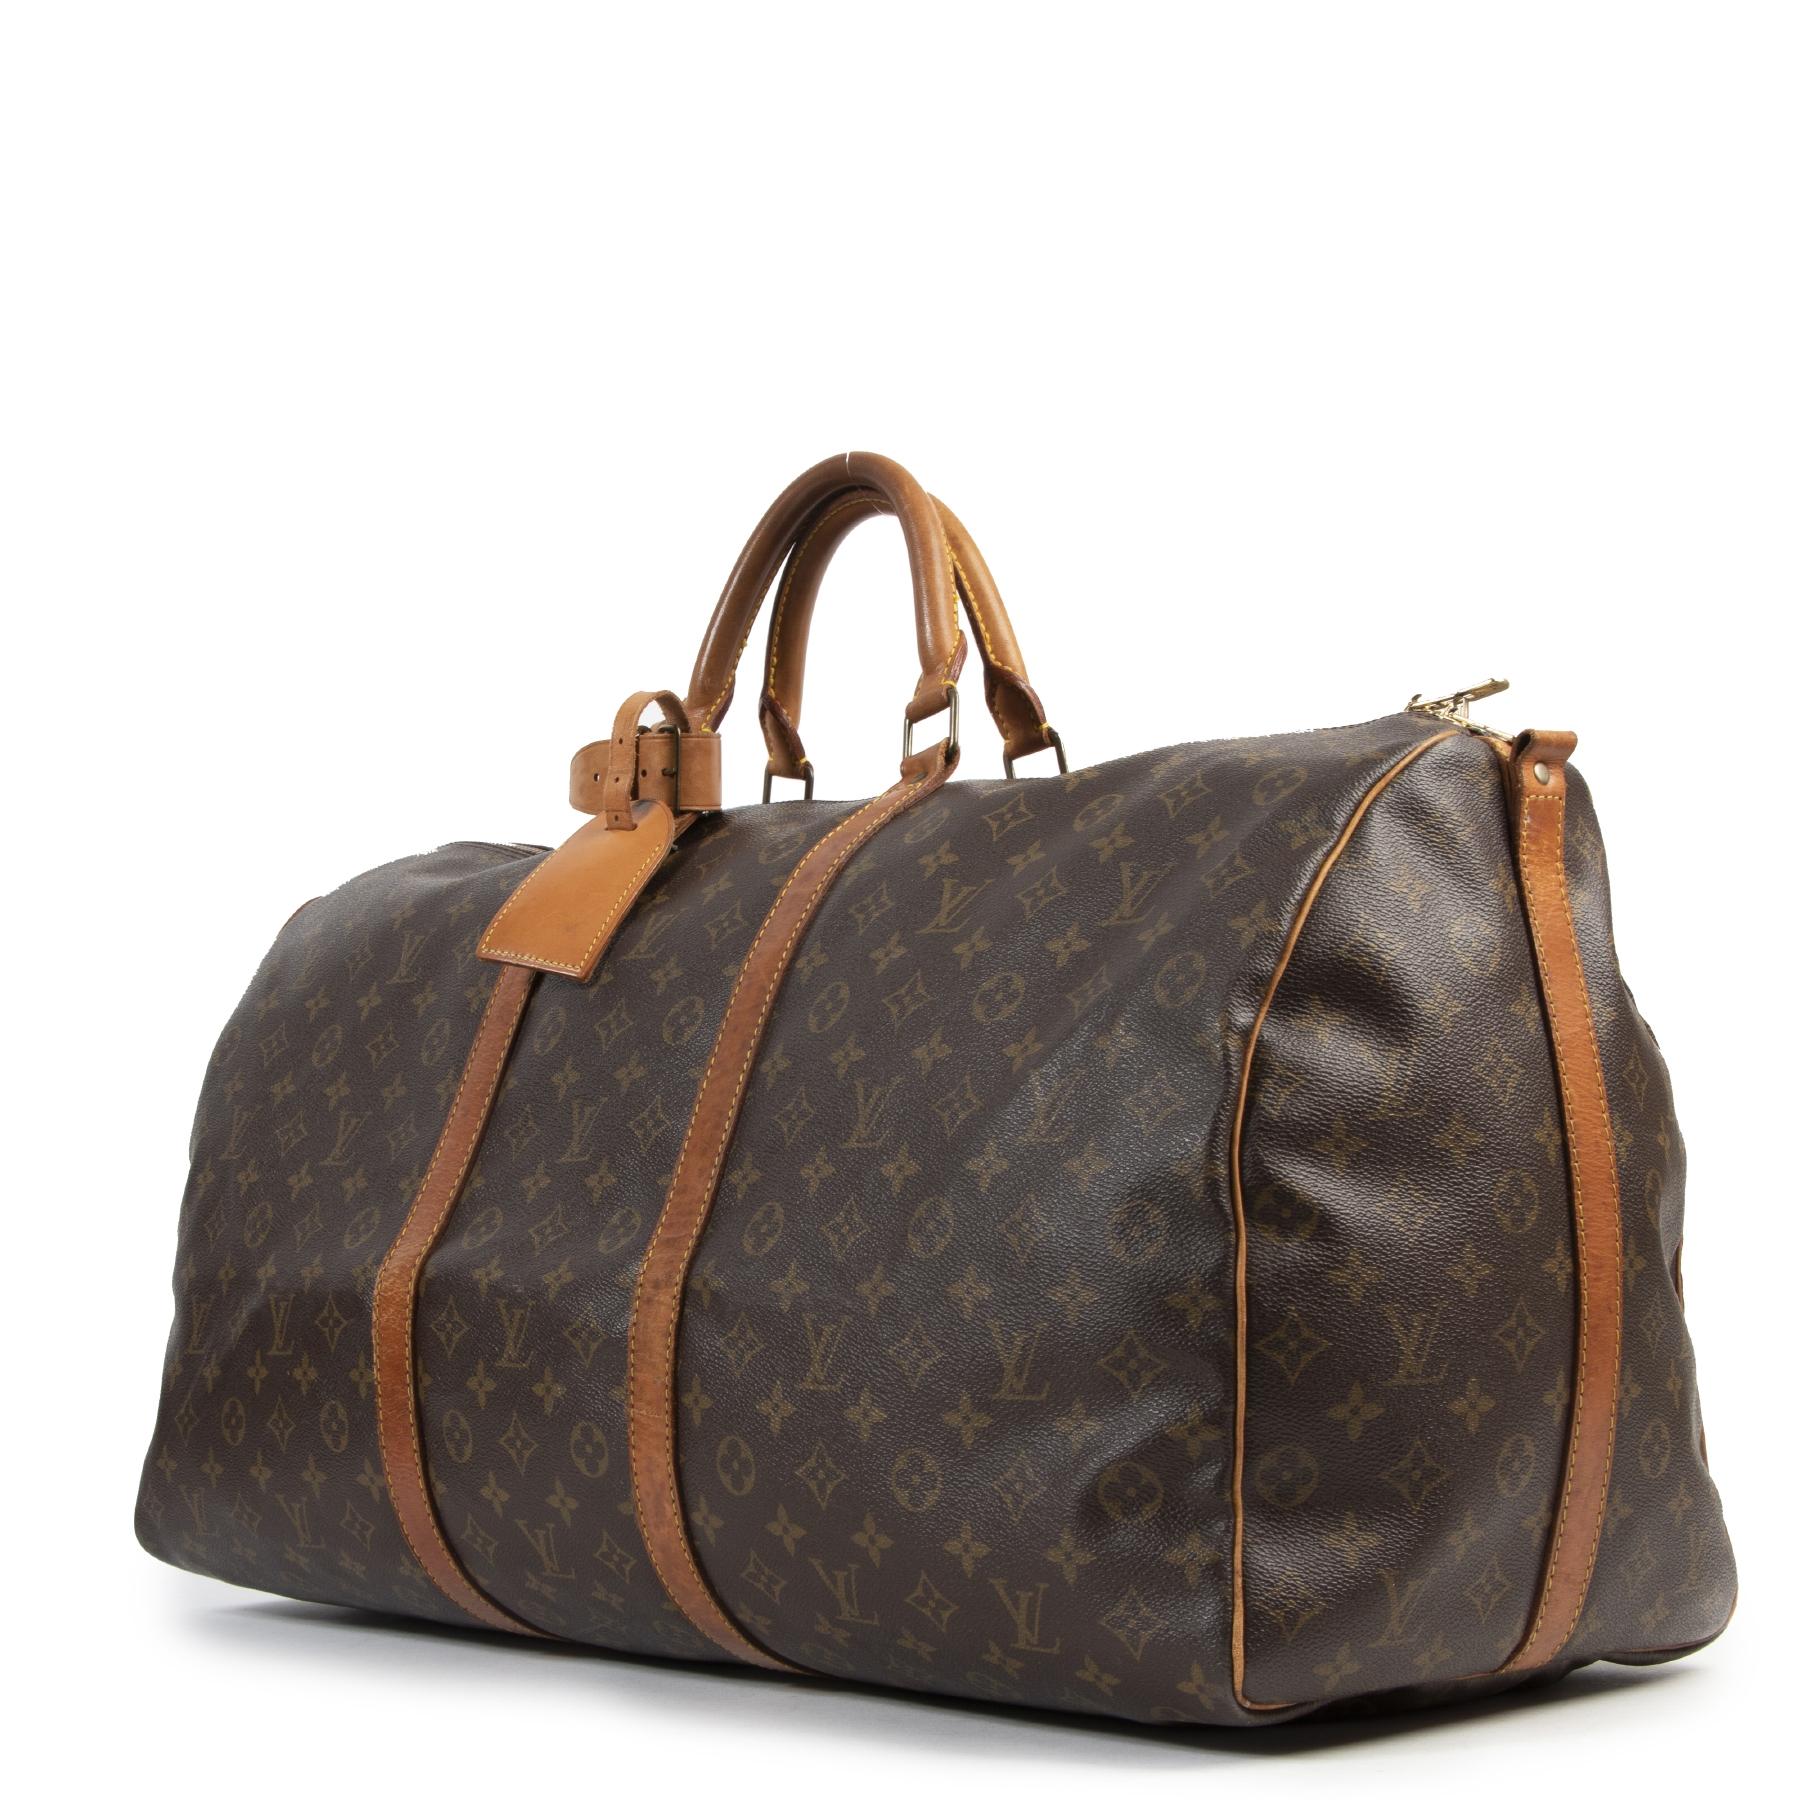 acheter en ligne seconde main Louis Vuitton Vintage Monogram Keepall 60  Travel Bag